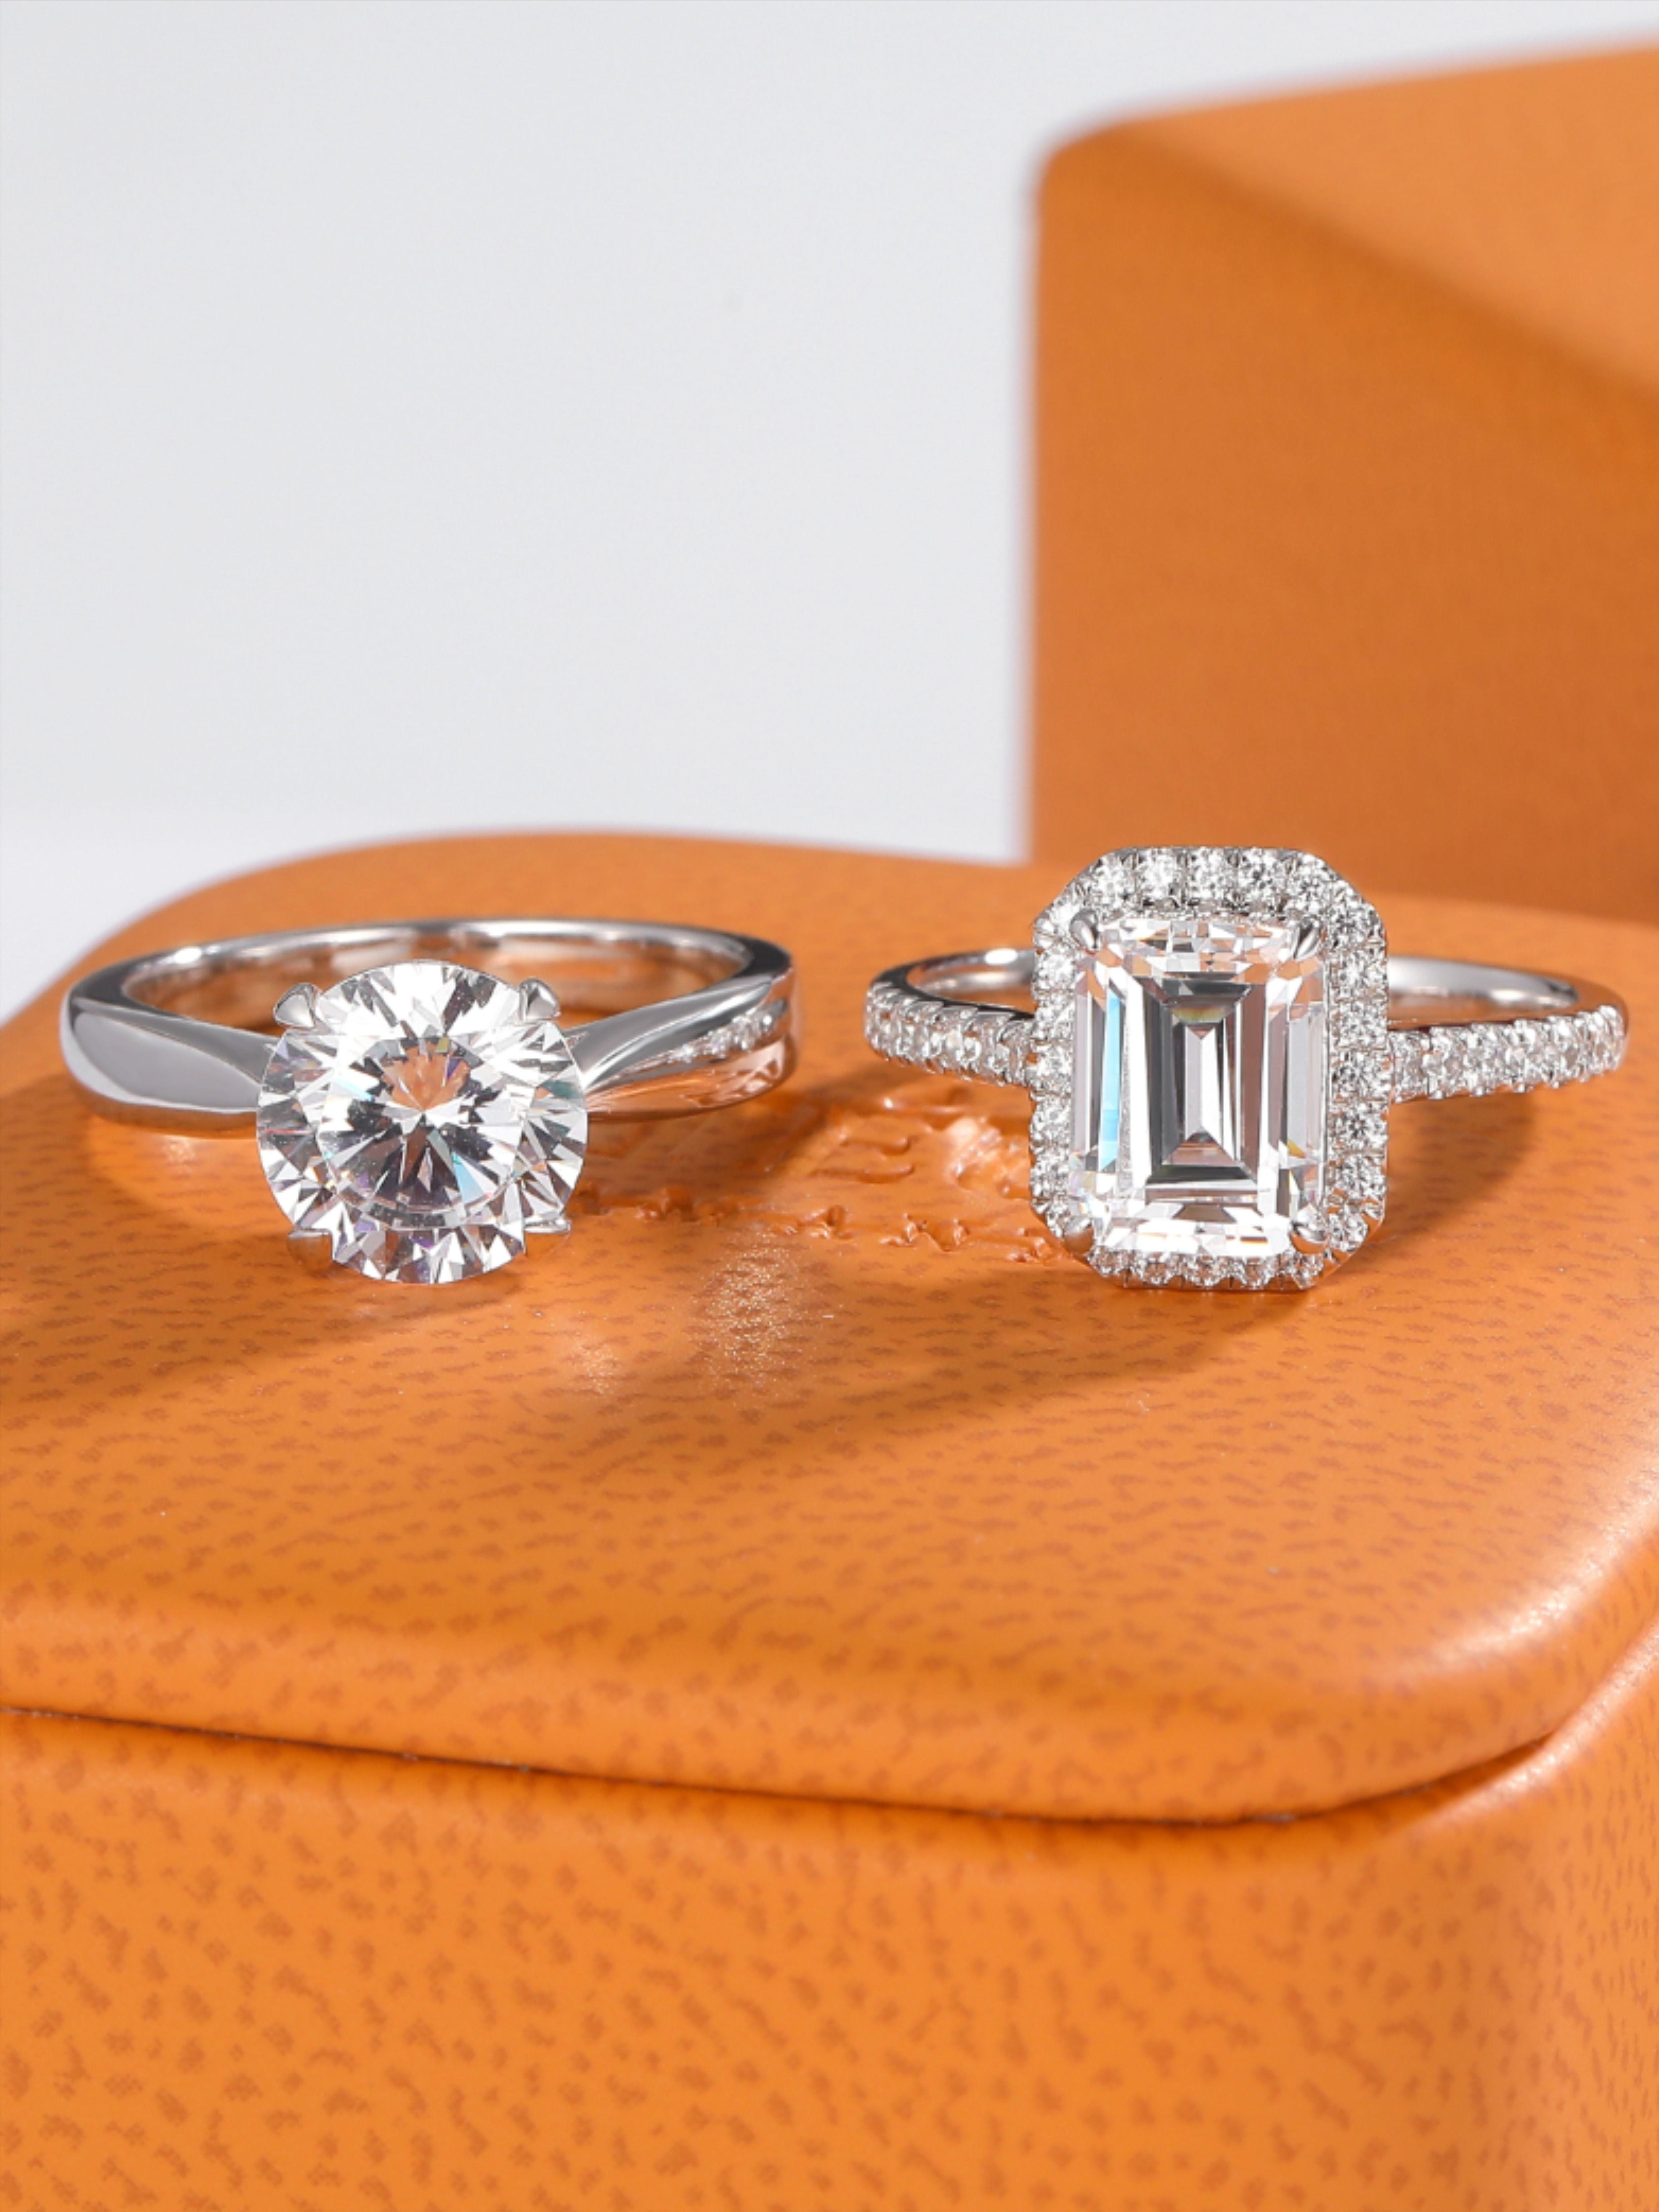 Sateur 1926 Attelee Ring In 2020 Jewelry Stone Jewelry Diamond